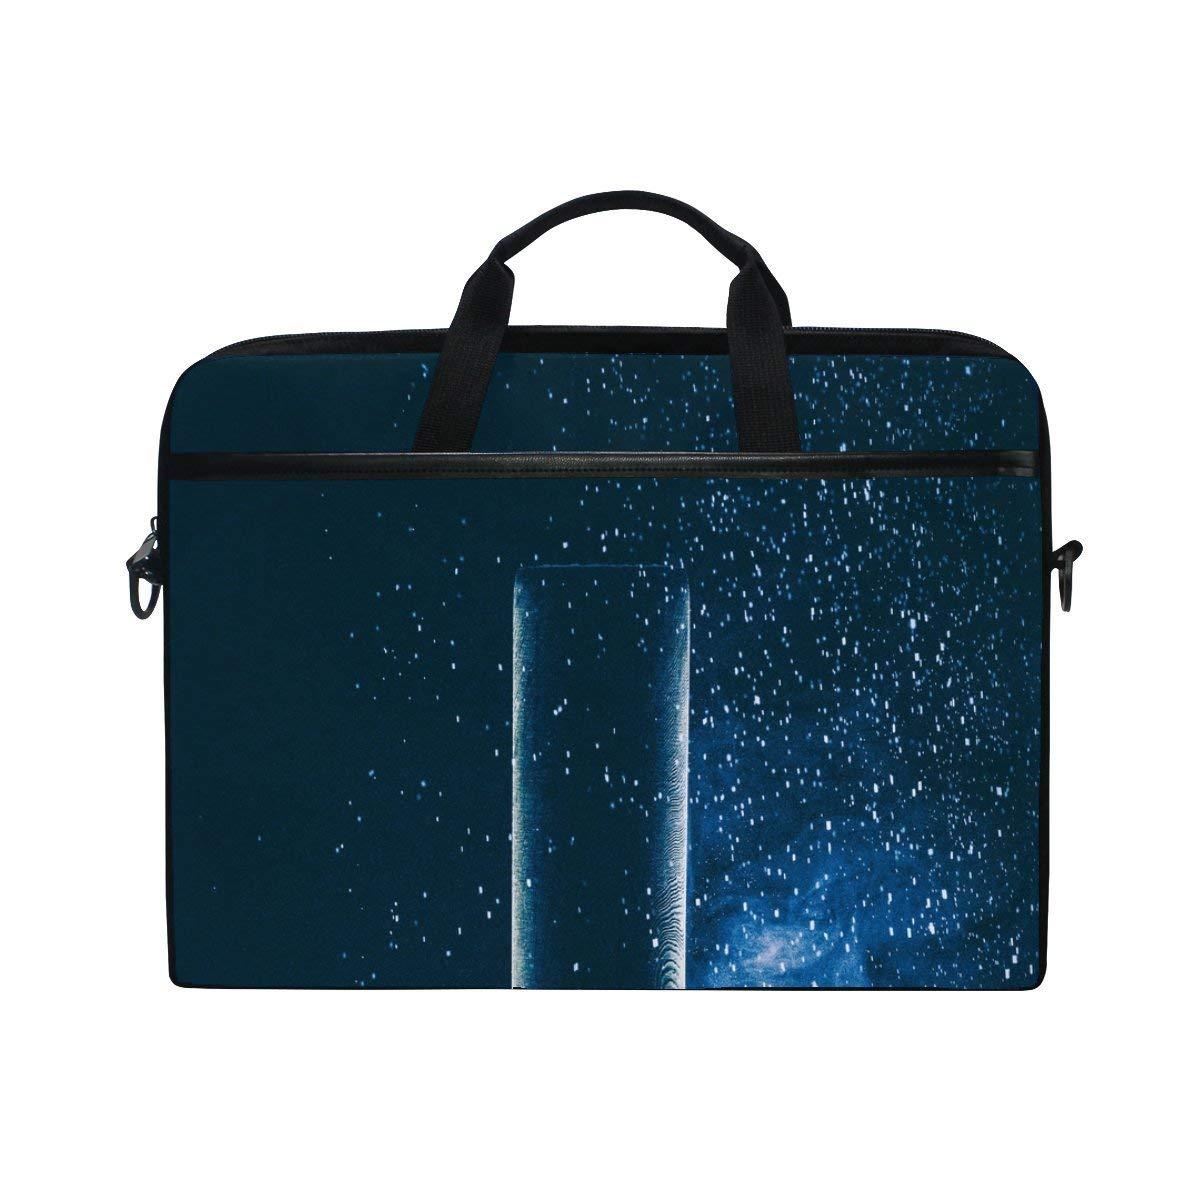 4dc2858312b1 Get Quotations · Rh Studio Laptop Bag Pin Rolling Smoke Stains Laptop  Shoulder Messenger Bag Case Sleeve For 14